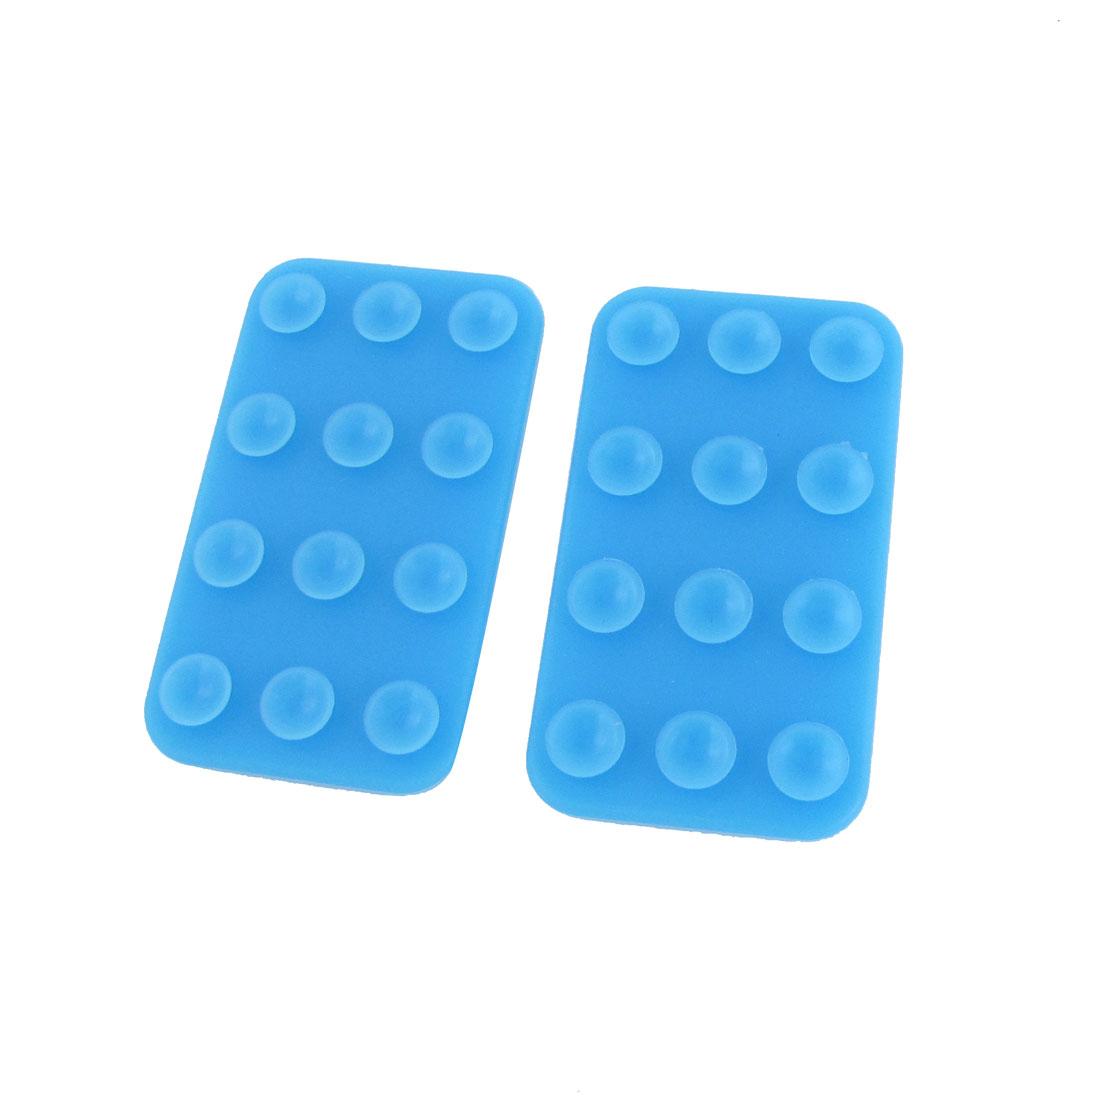 2pcs Simple Mobile Phone Sucker Magic Mat Holder Blue for Smartphone